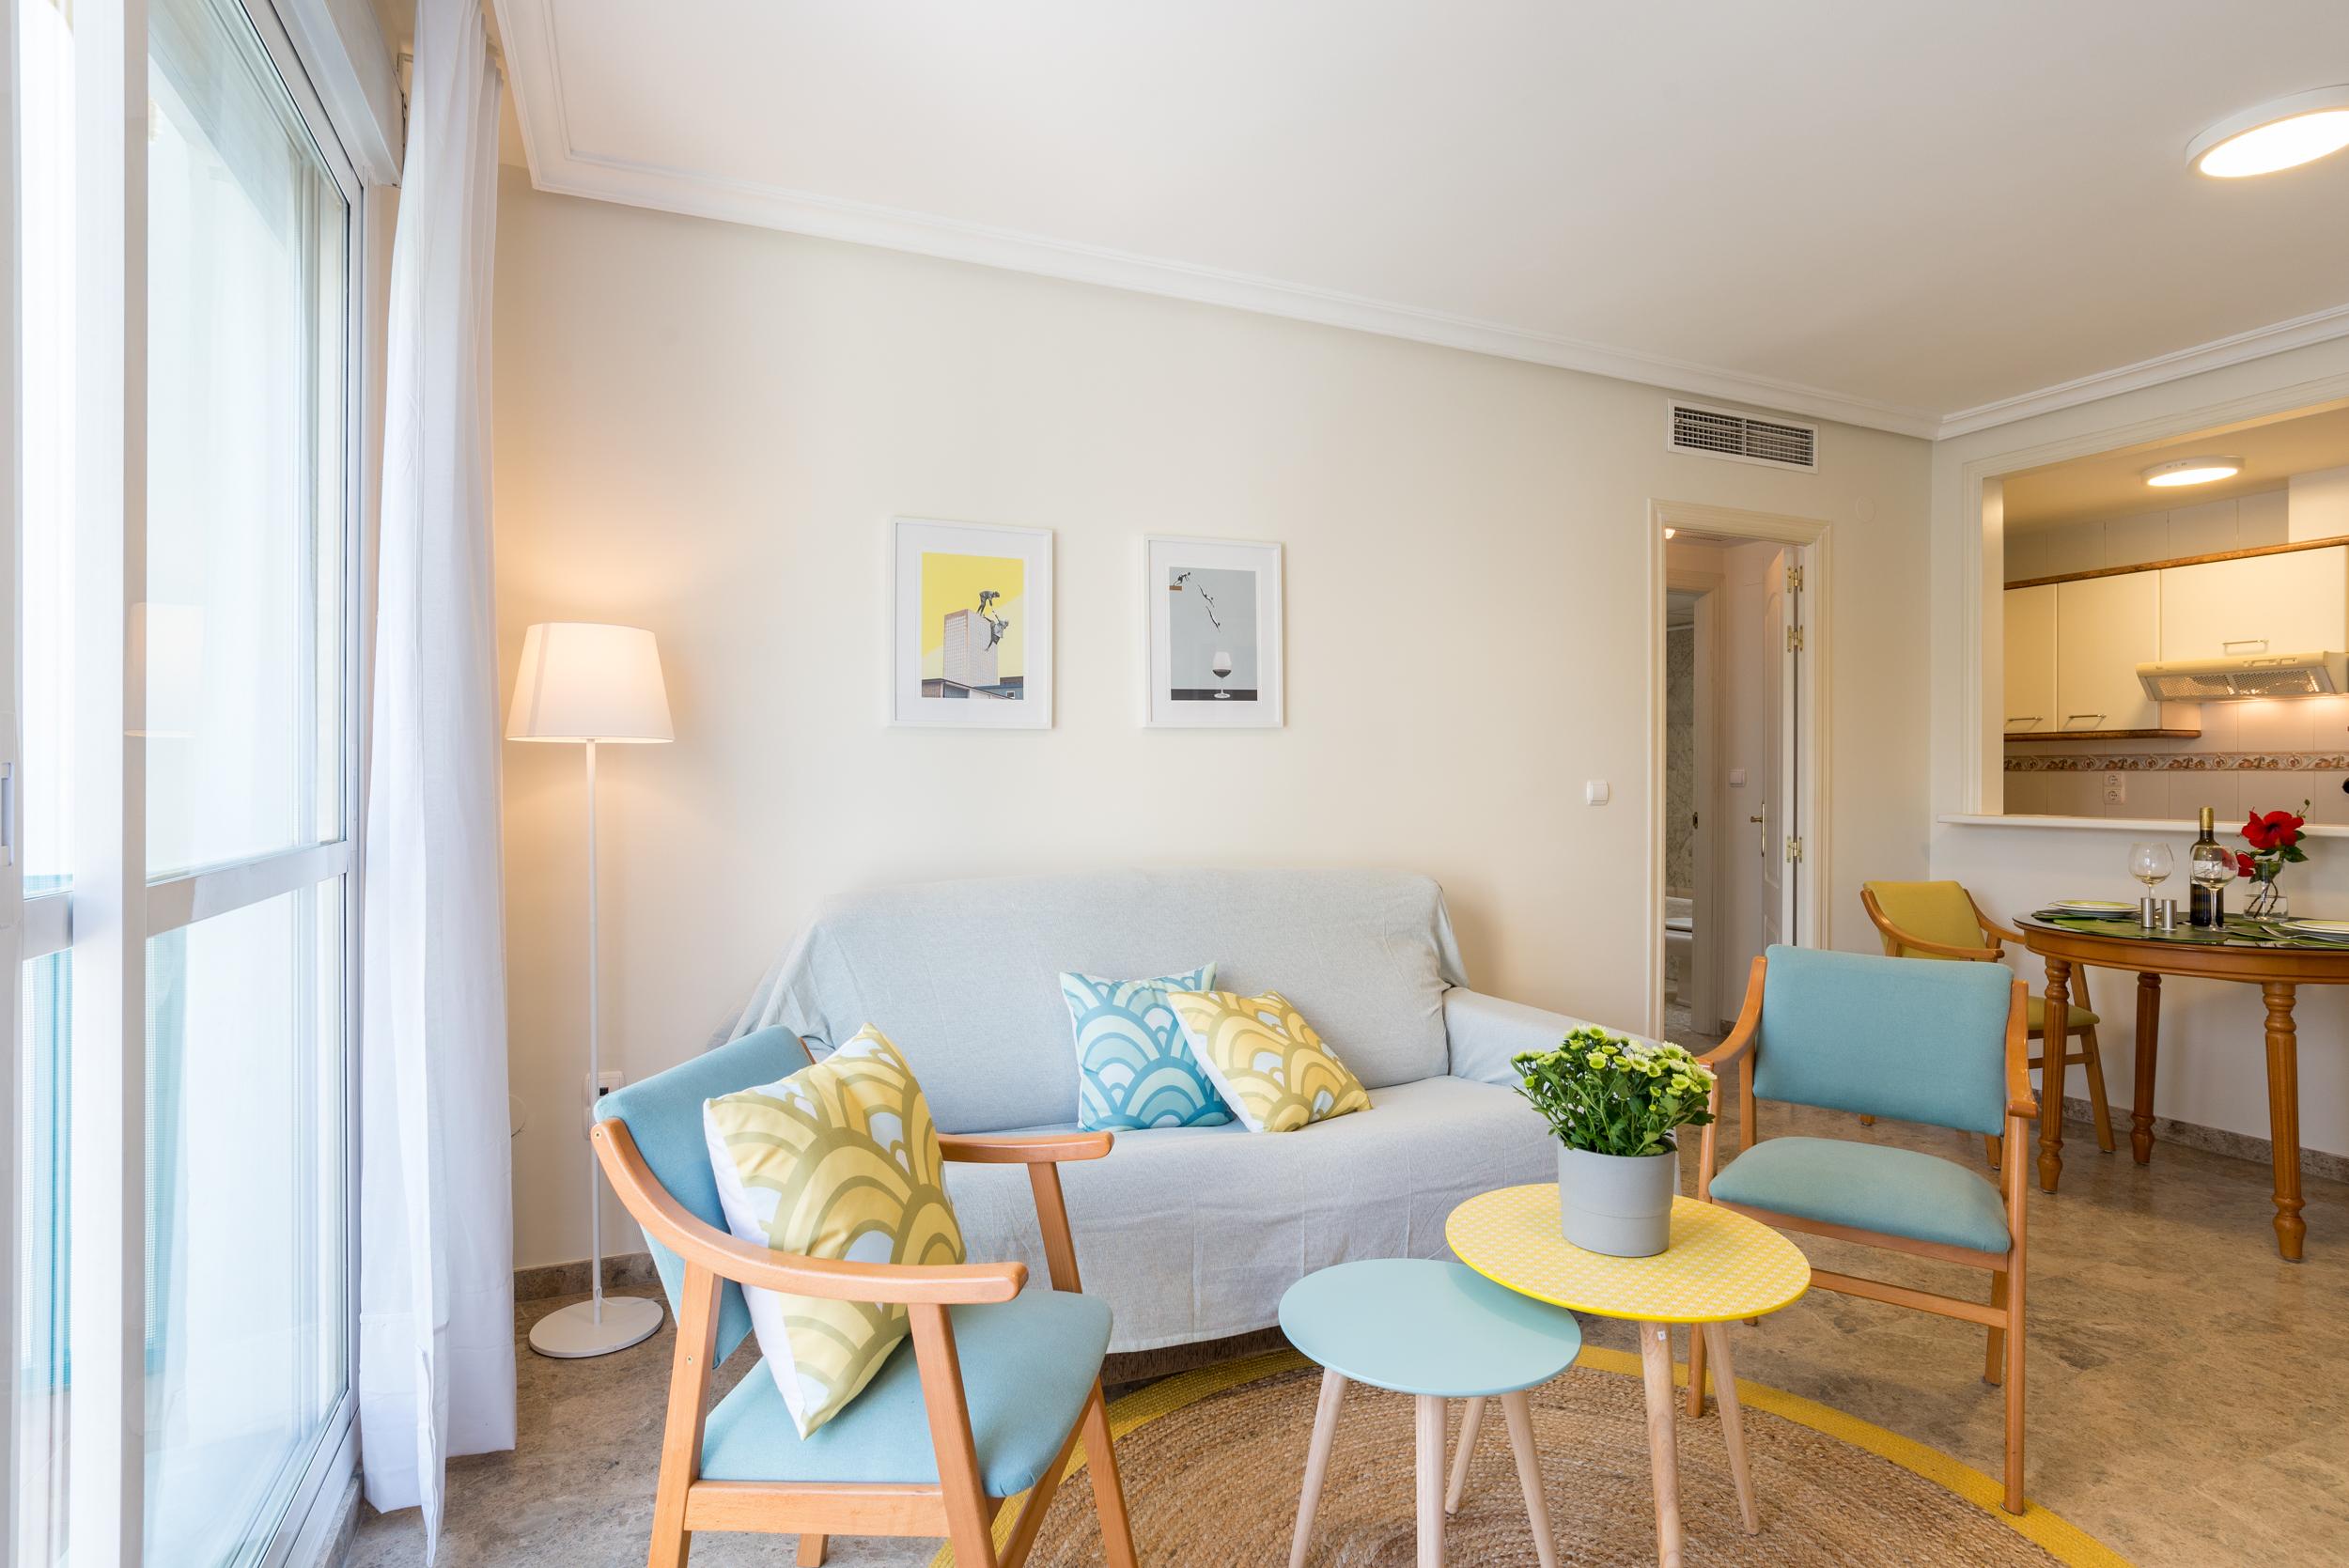 Apartment MalagaSuite Lux Beach   Pool photo 20403118